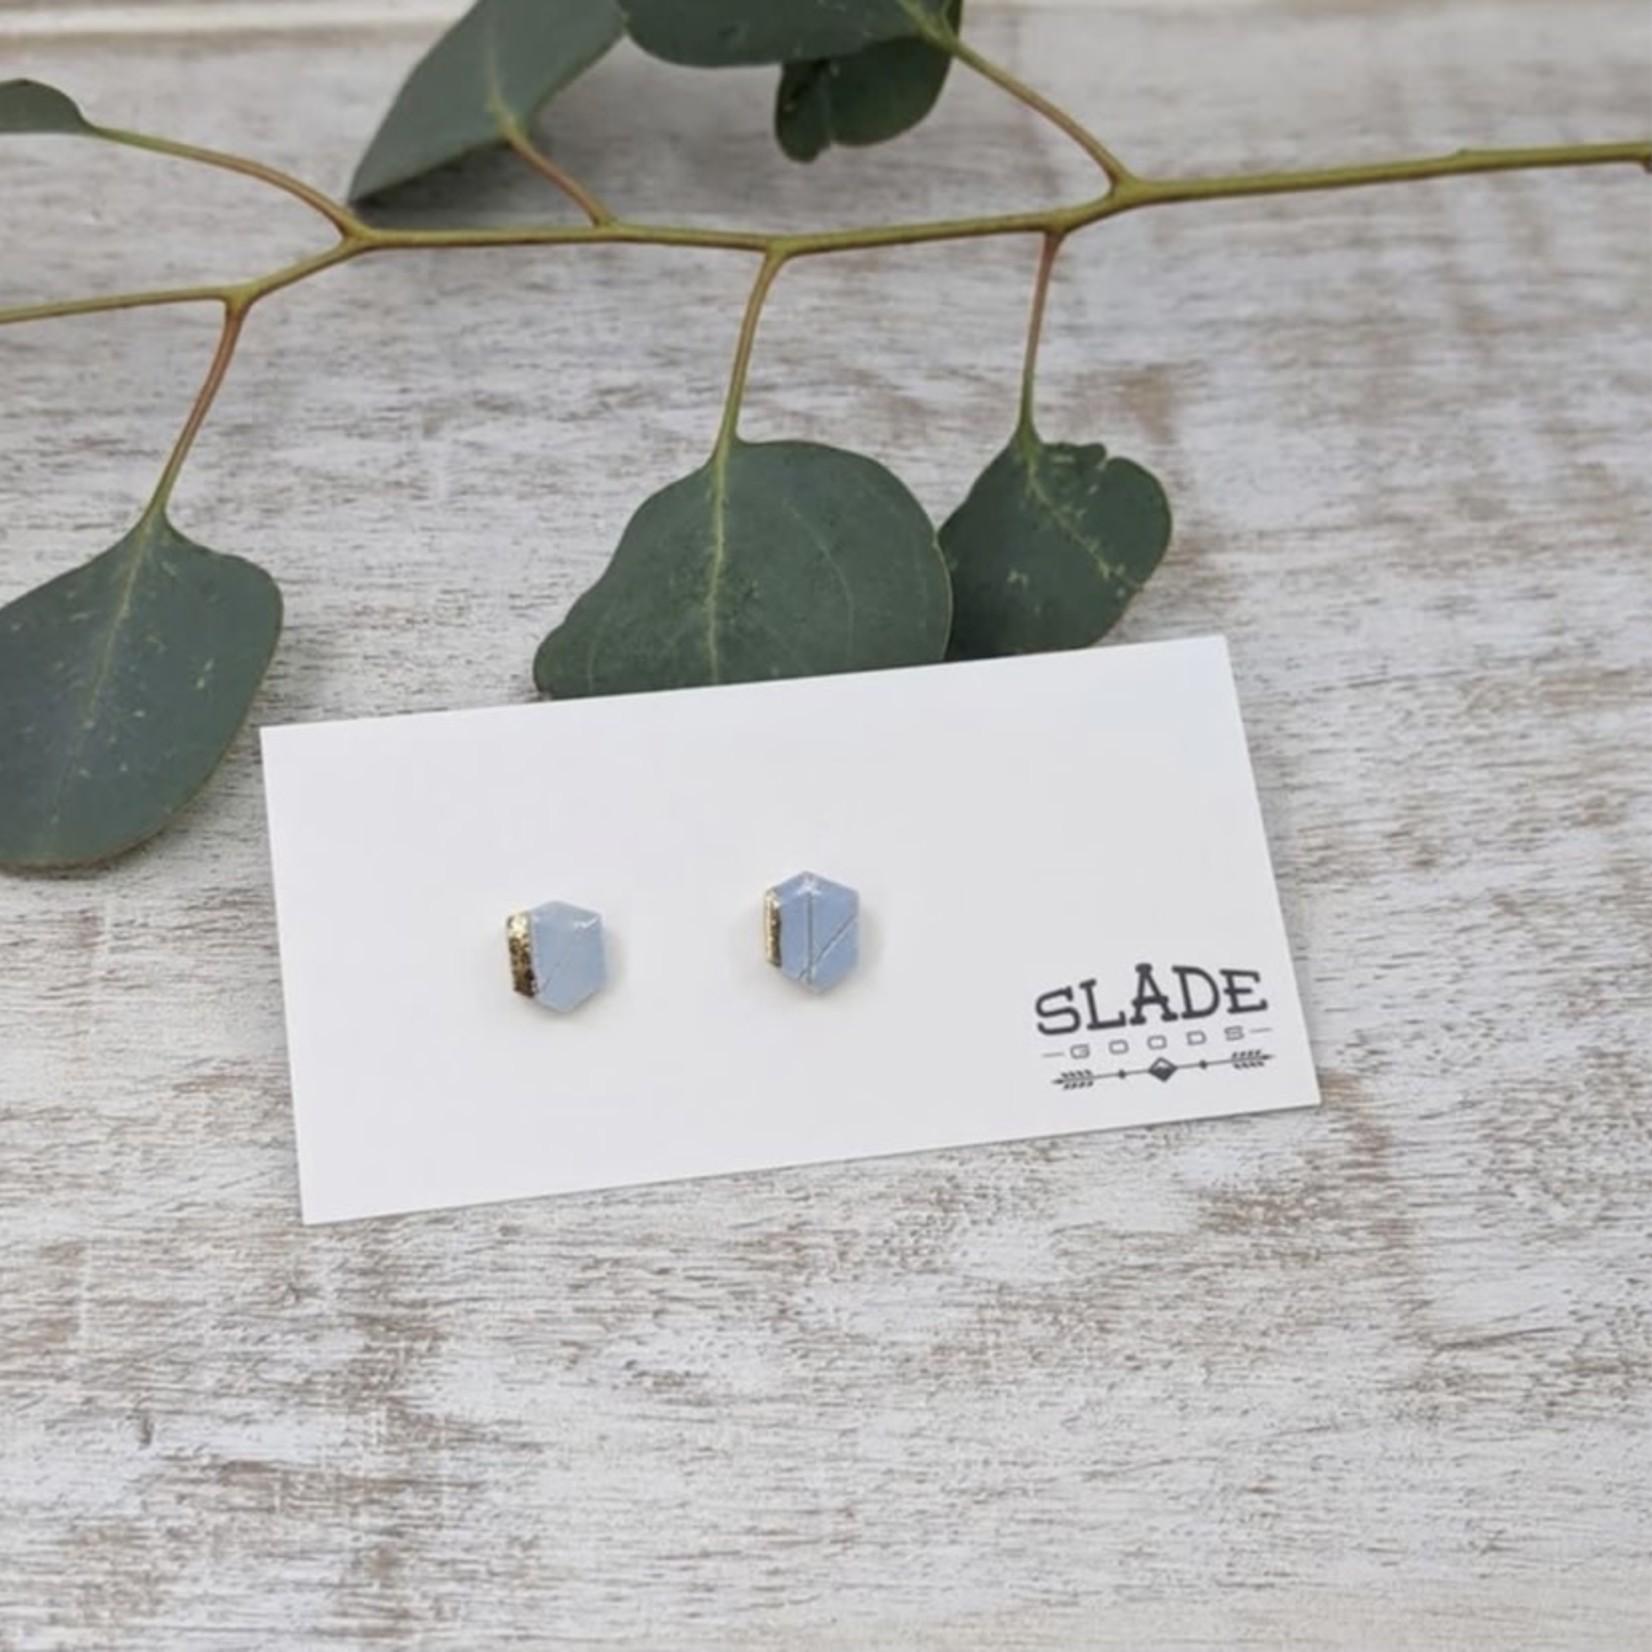 Slade Goods Gold Trim Stud Earrings